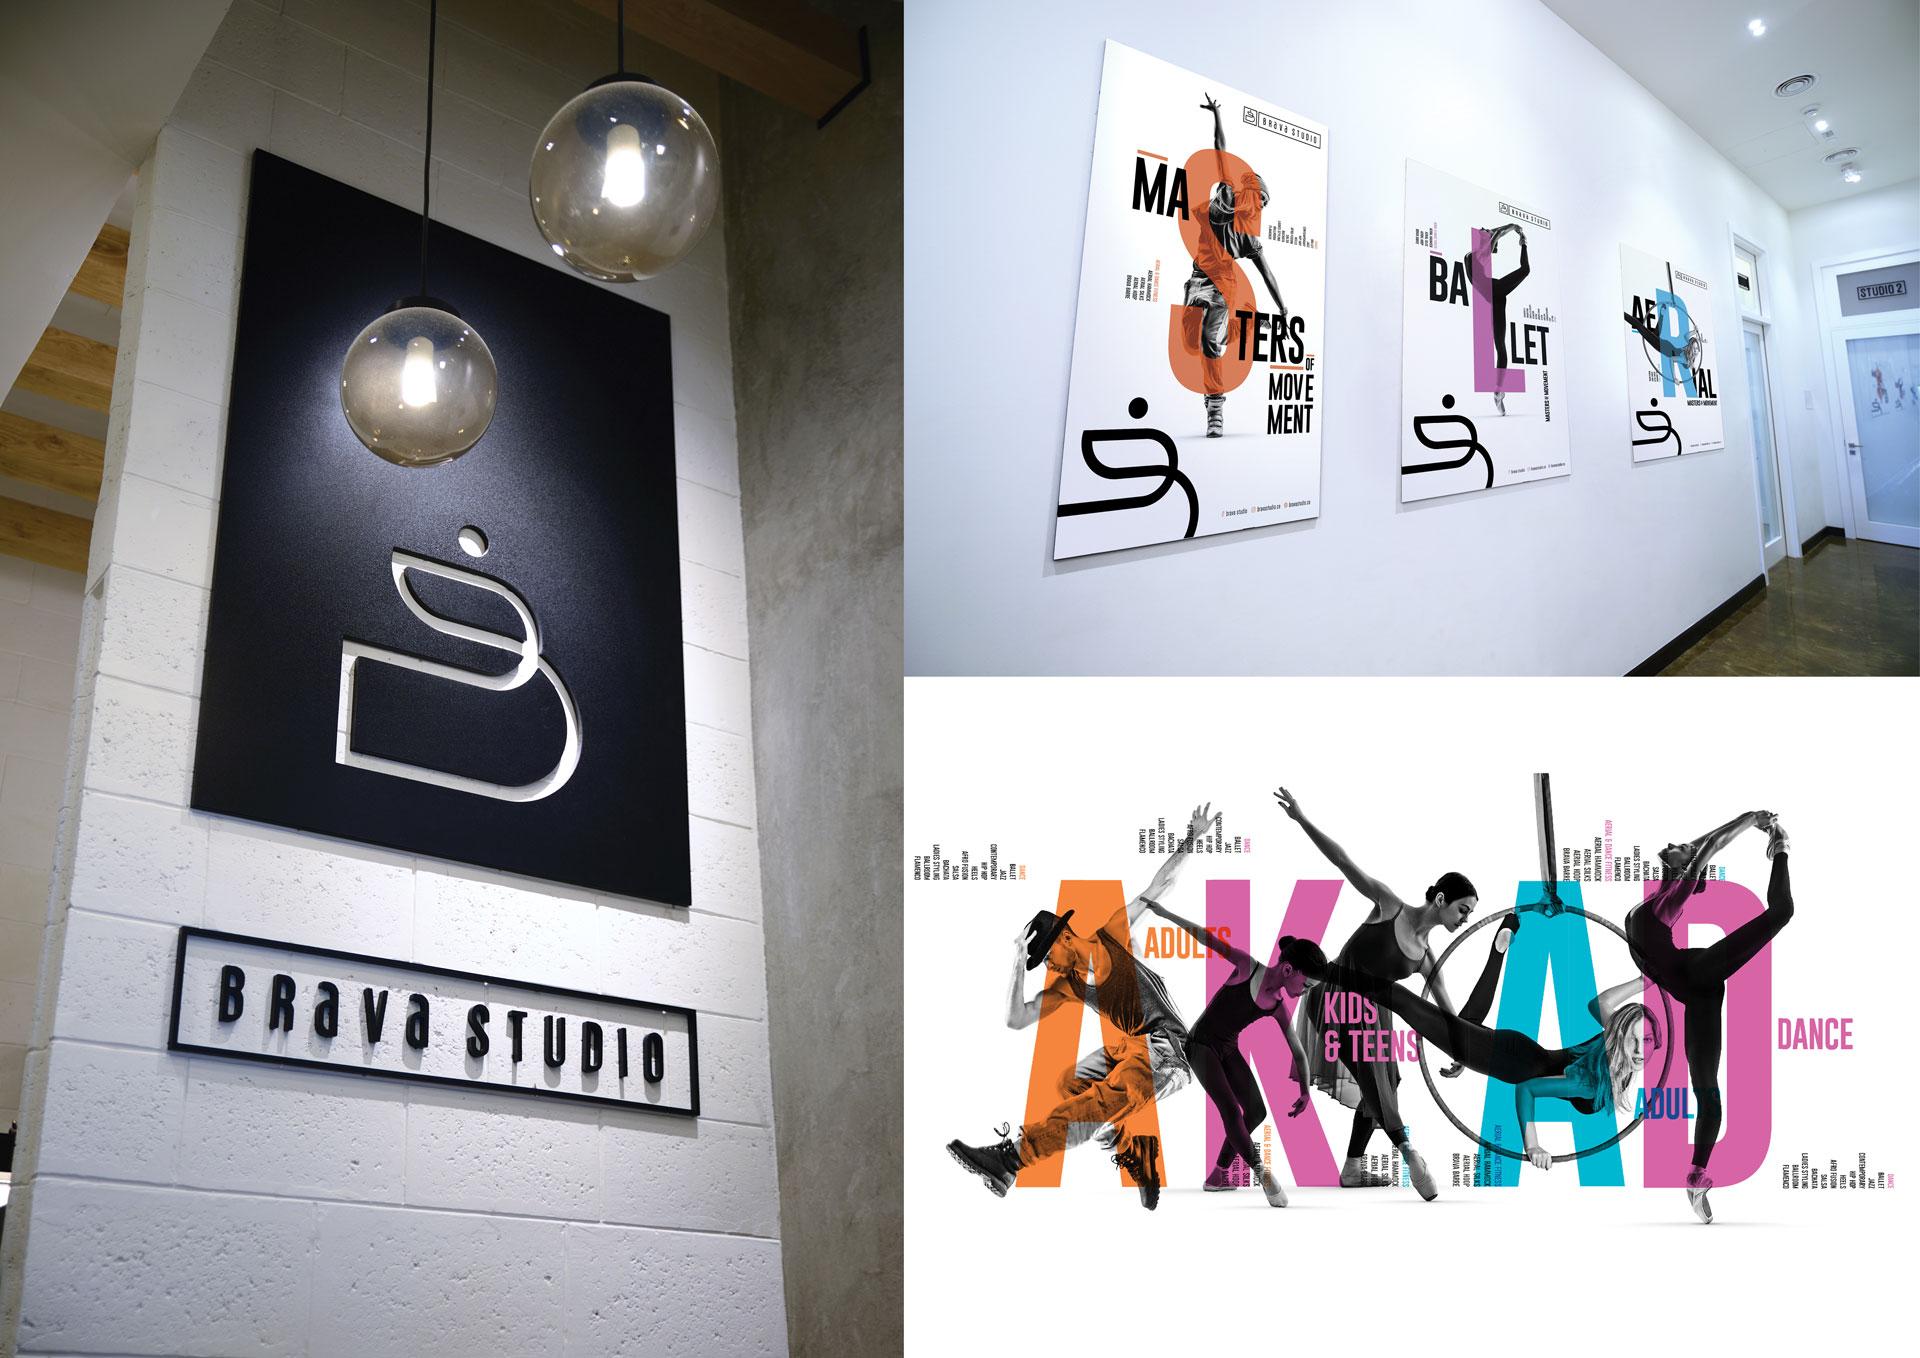 The Creative Union - Brava Studio11.jpg